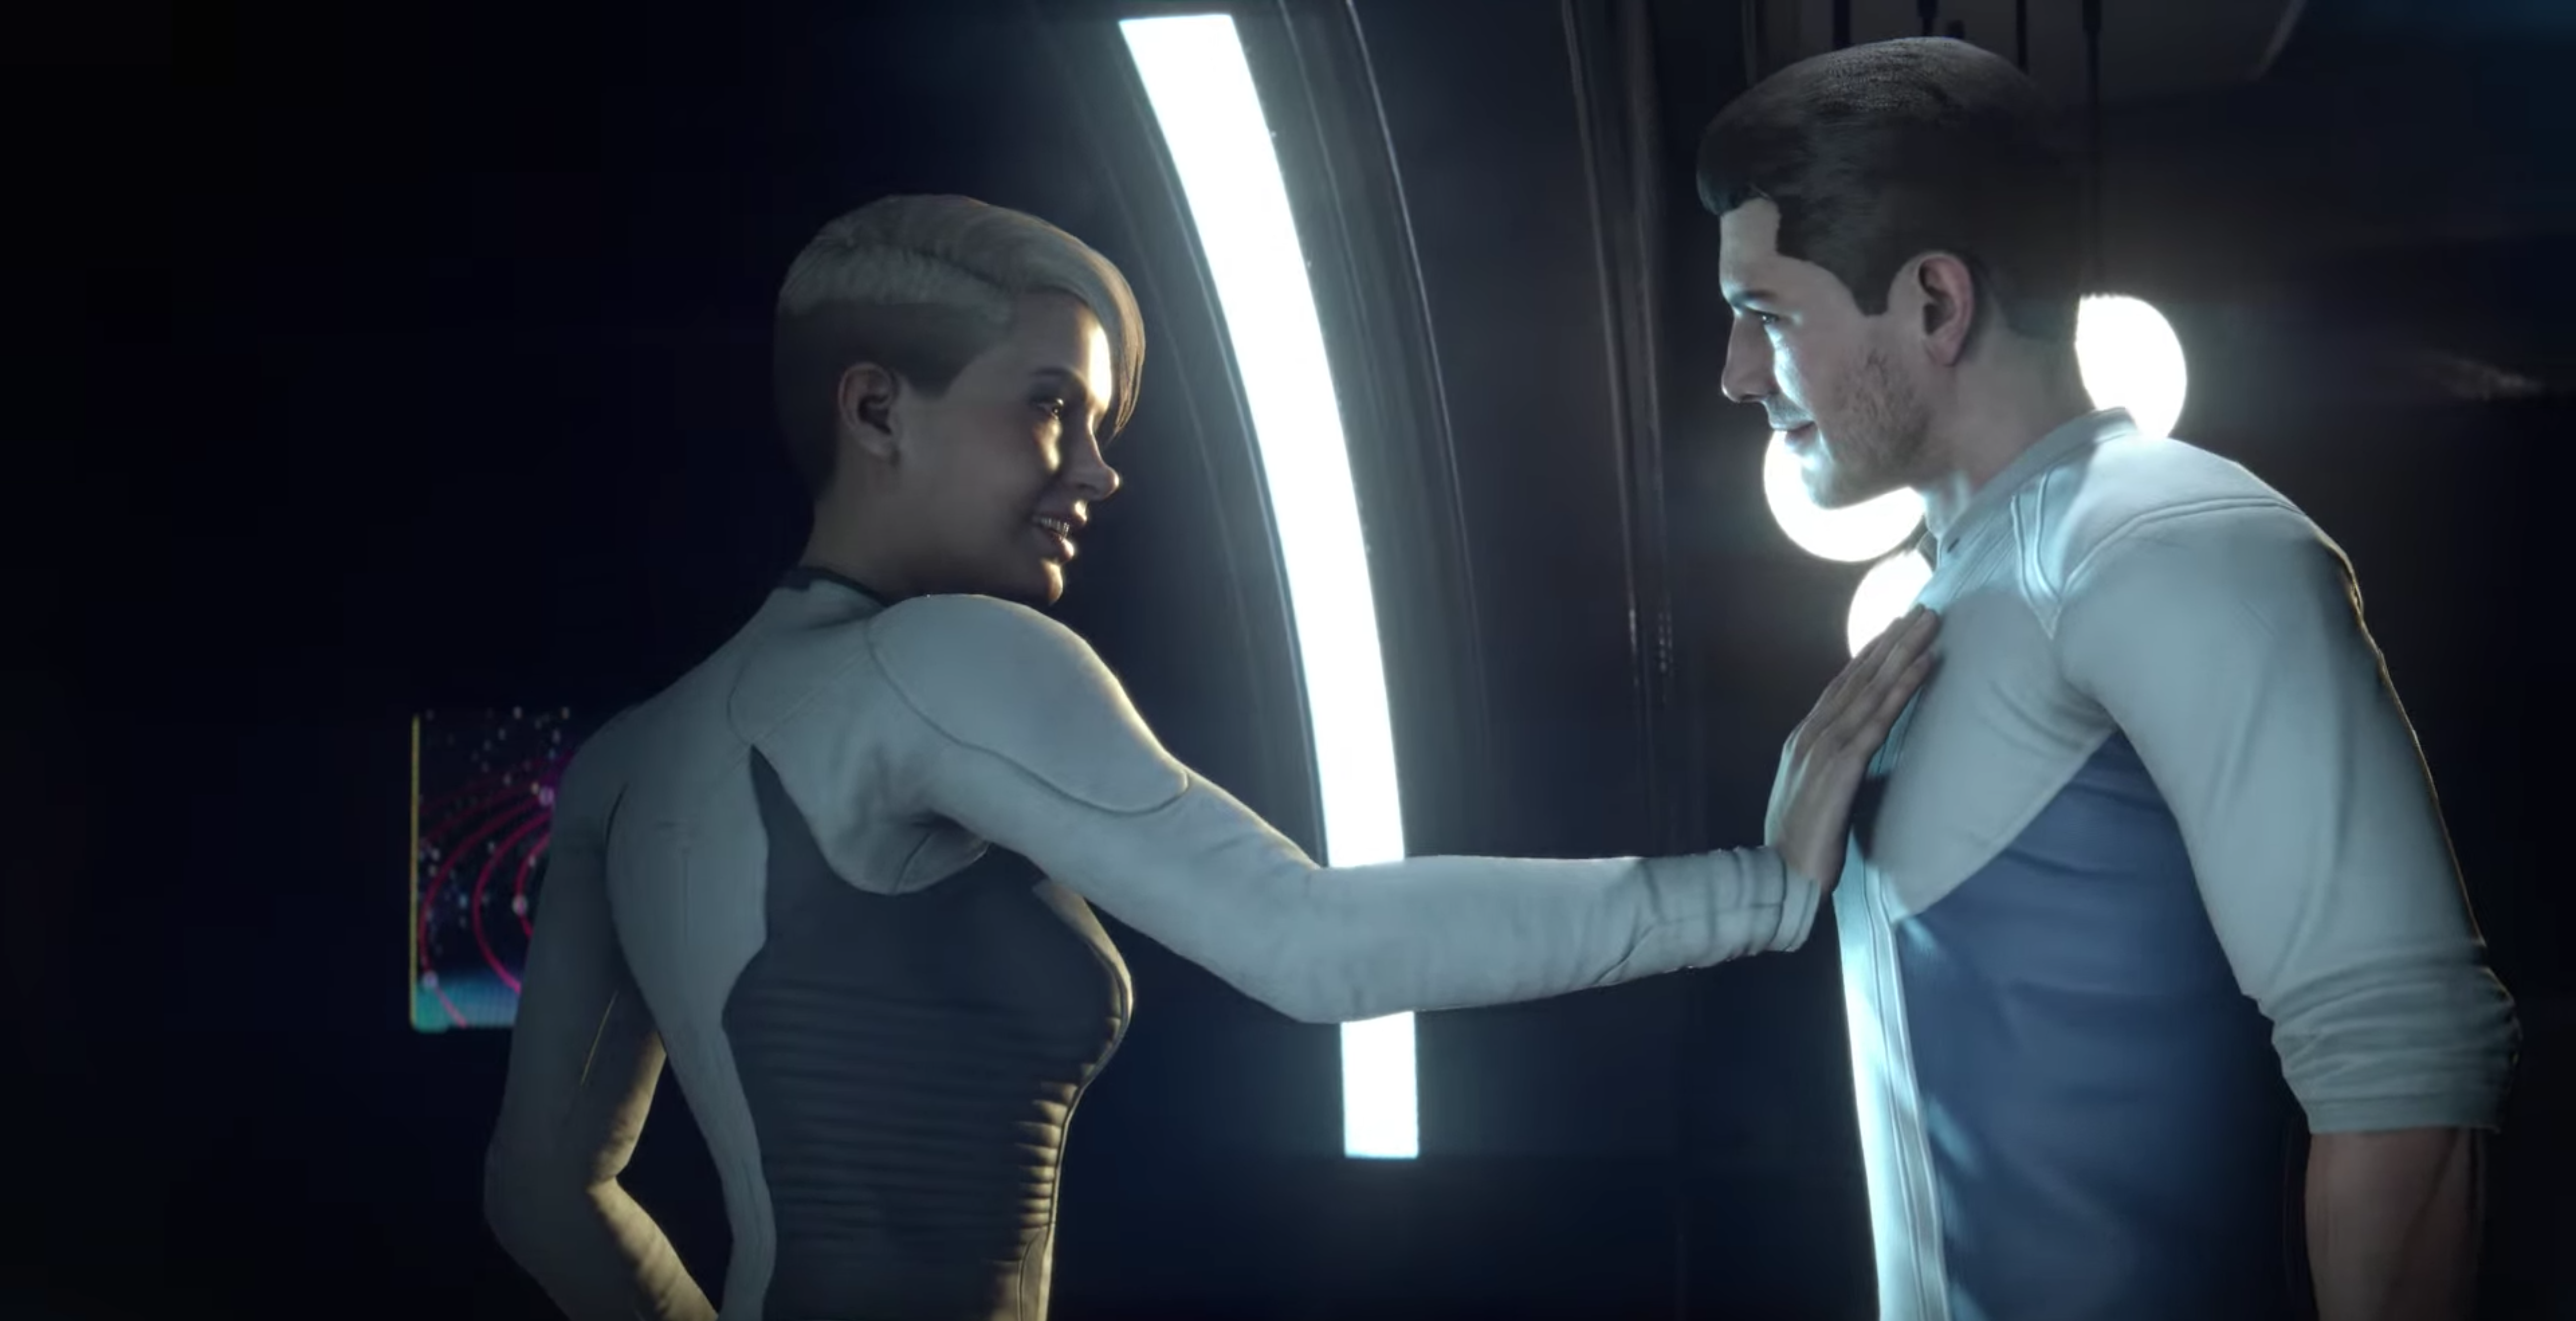 Mass Effect: Andromeda romance